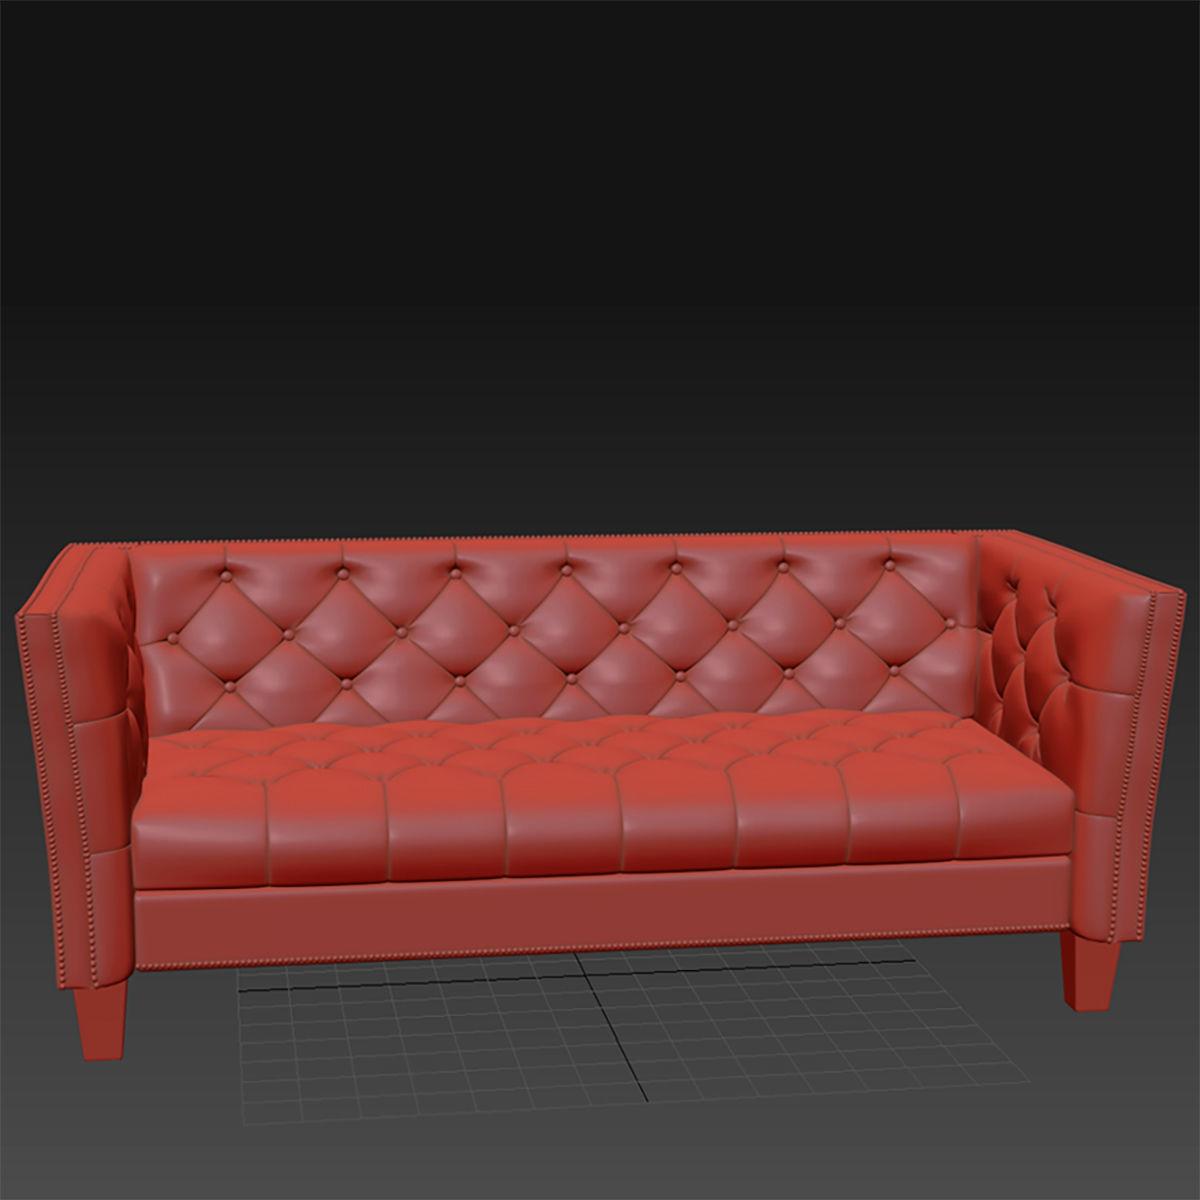 3D model Sofa No 4 - Preston Gray Bi-Cast Leather Sofa